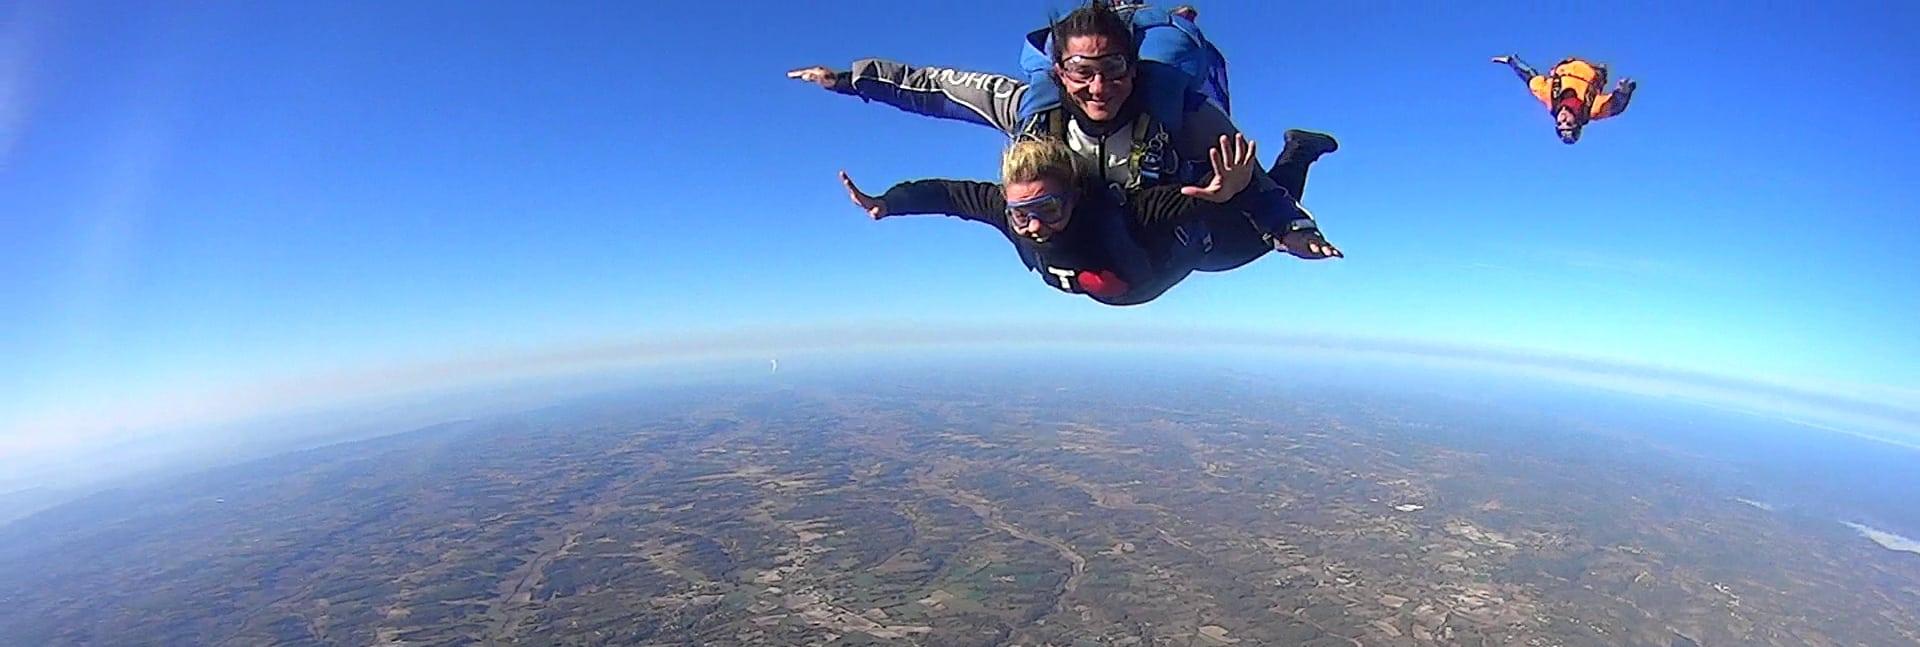 Tandem2 medialot - Saut en parachute nevers ...